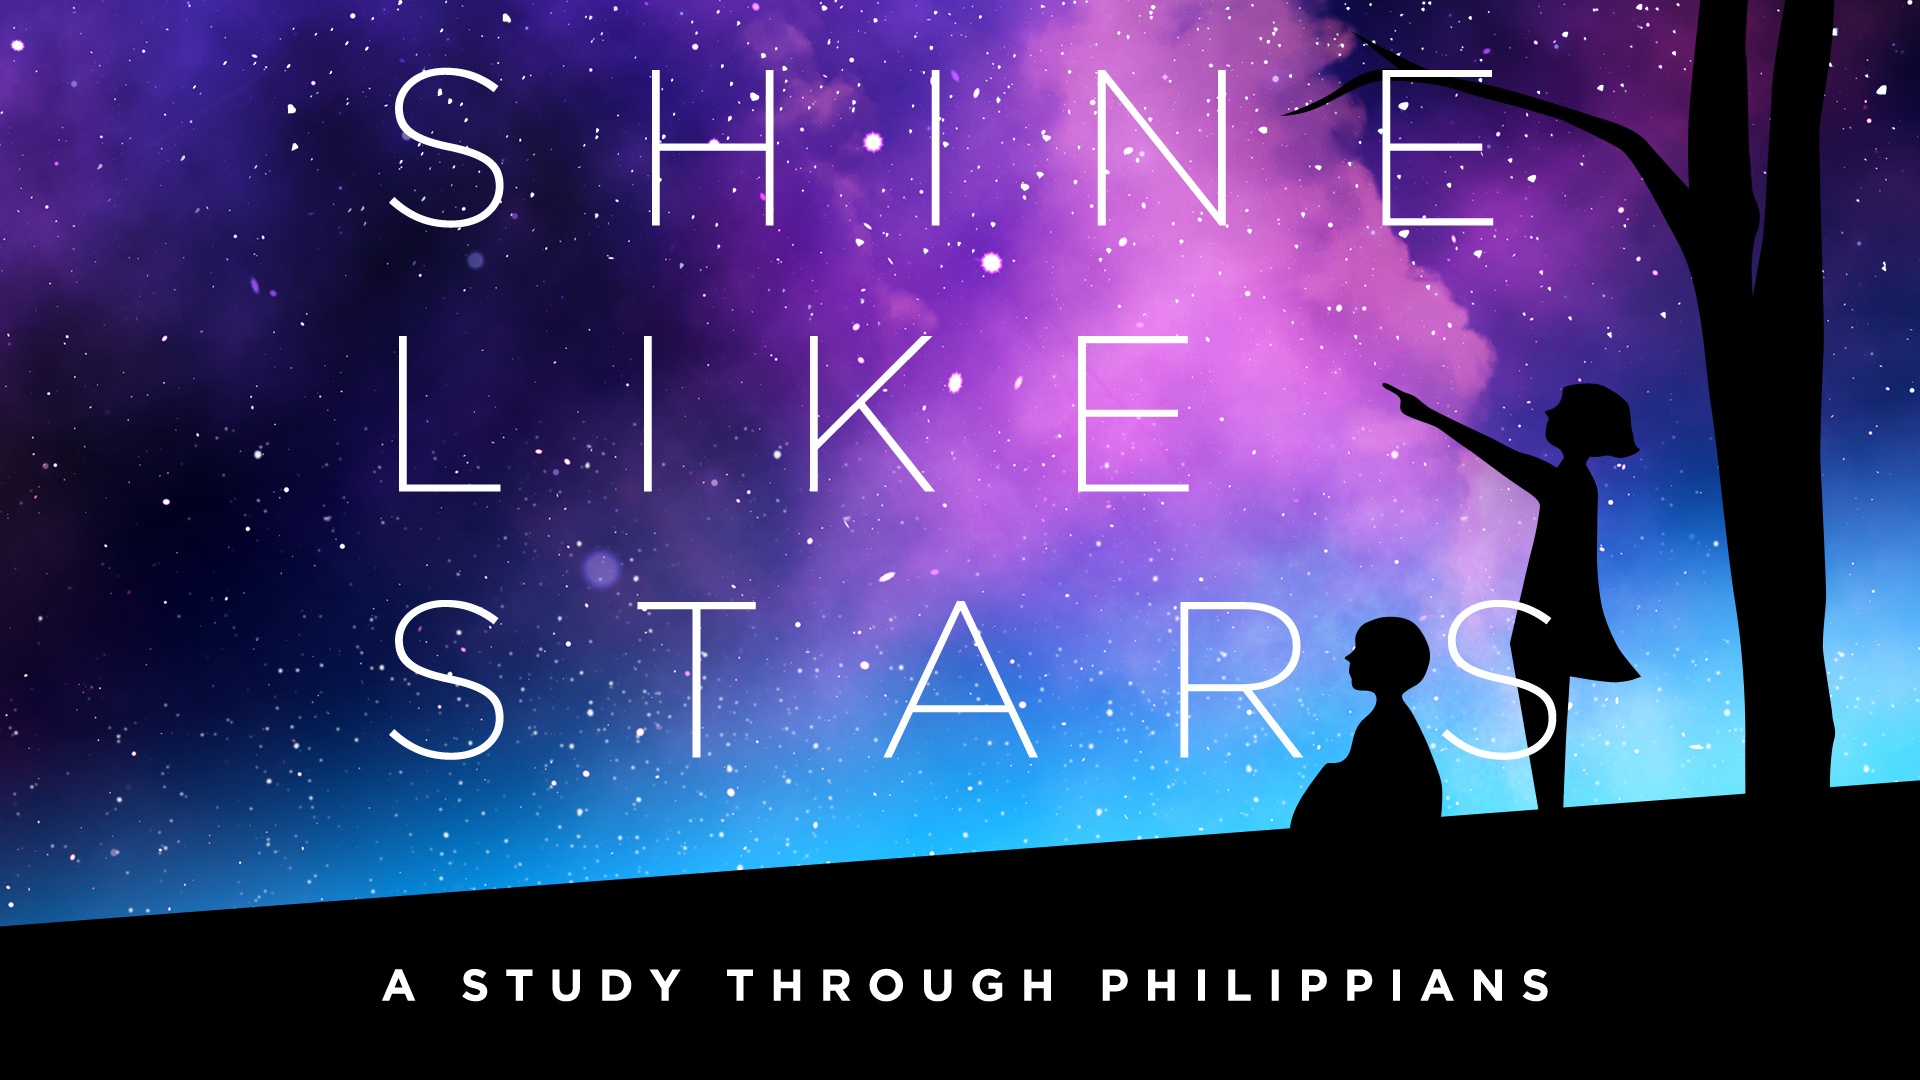 Stars_Series-Title.jpg